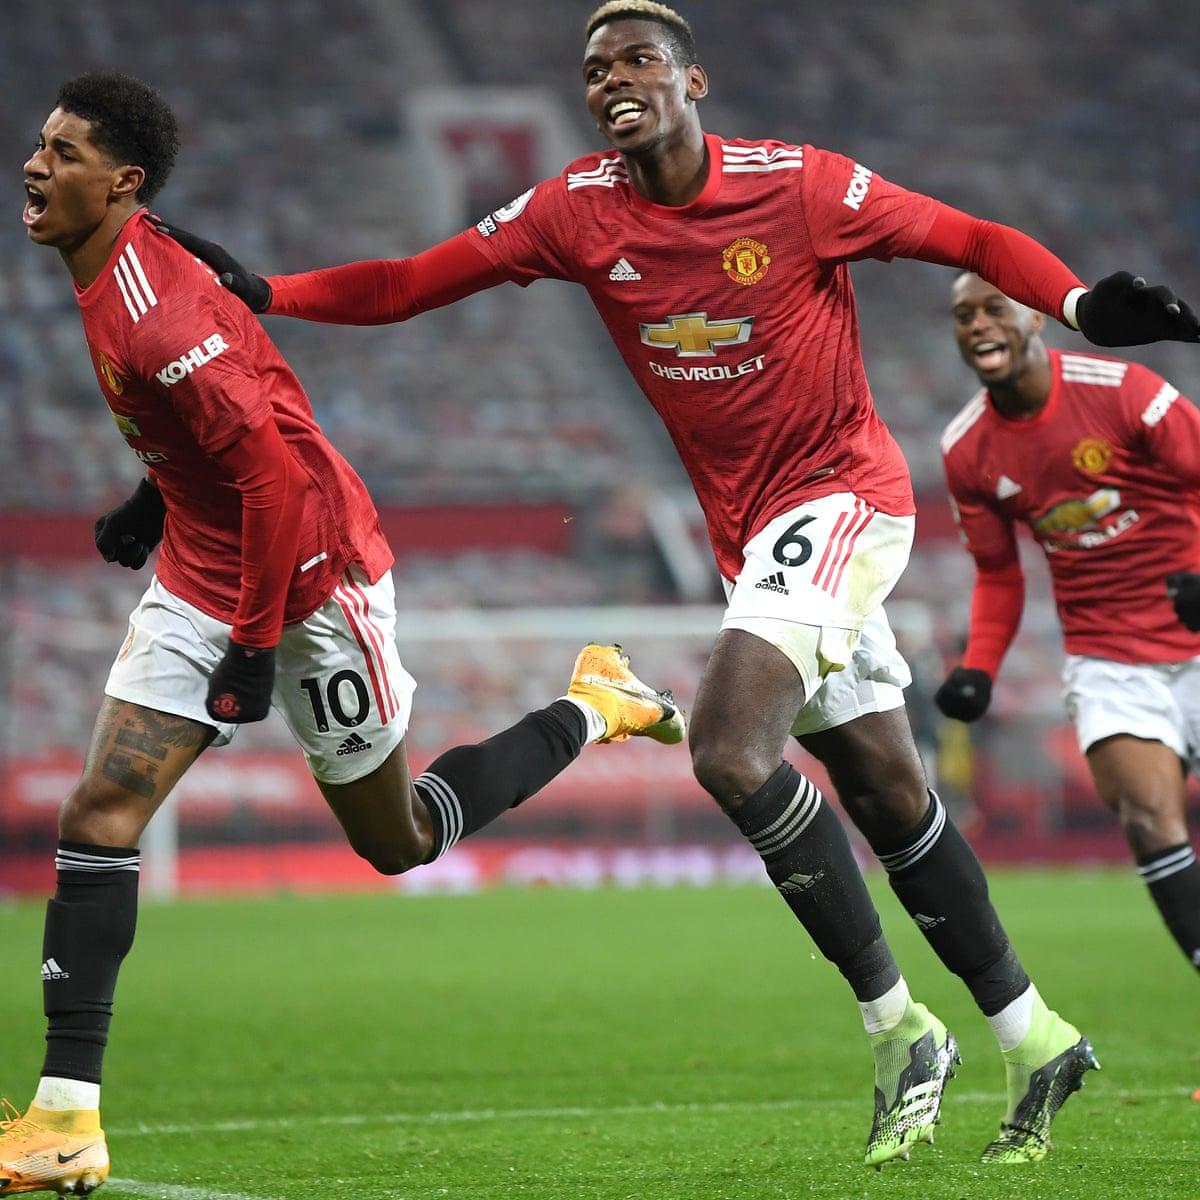 Manchester United vence dramáticamente a Wolverhampton con gol de Marcus Rashford